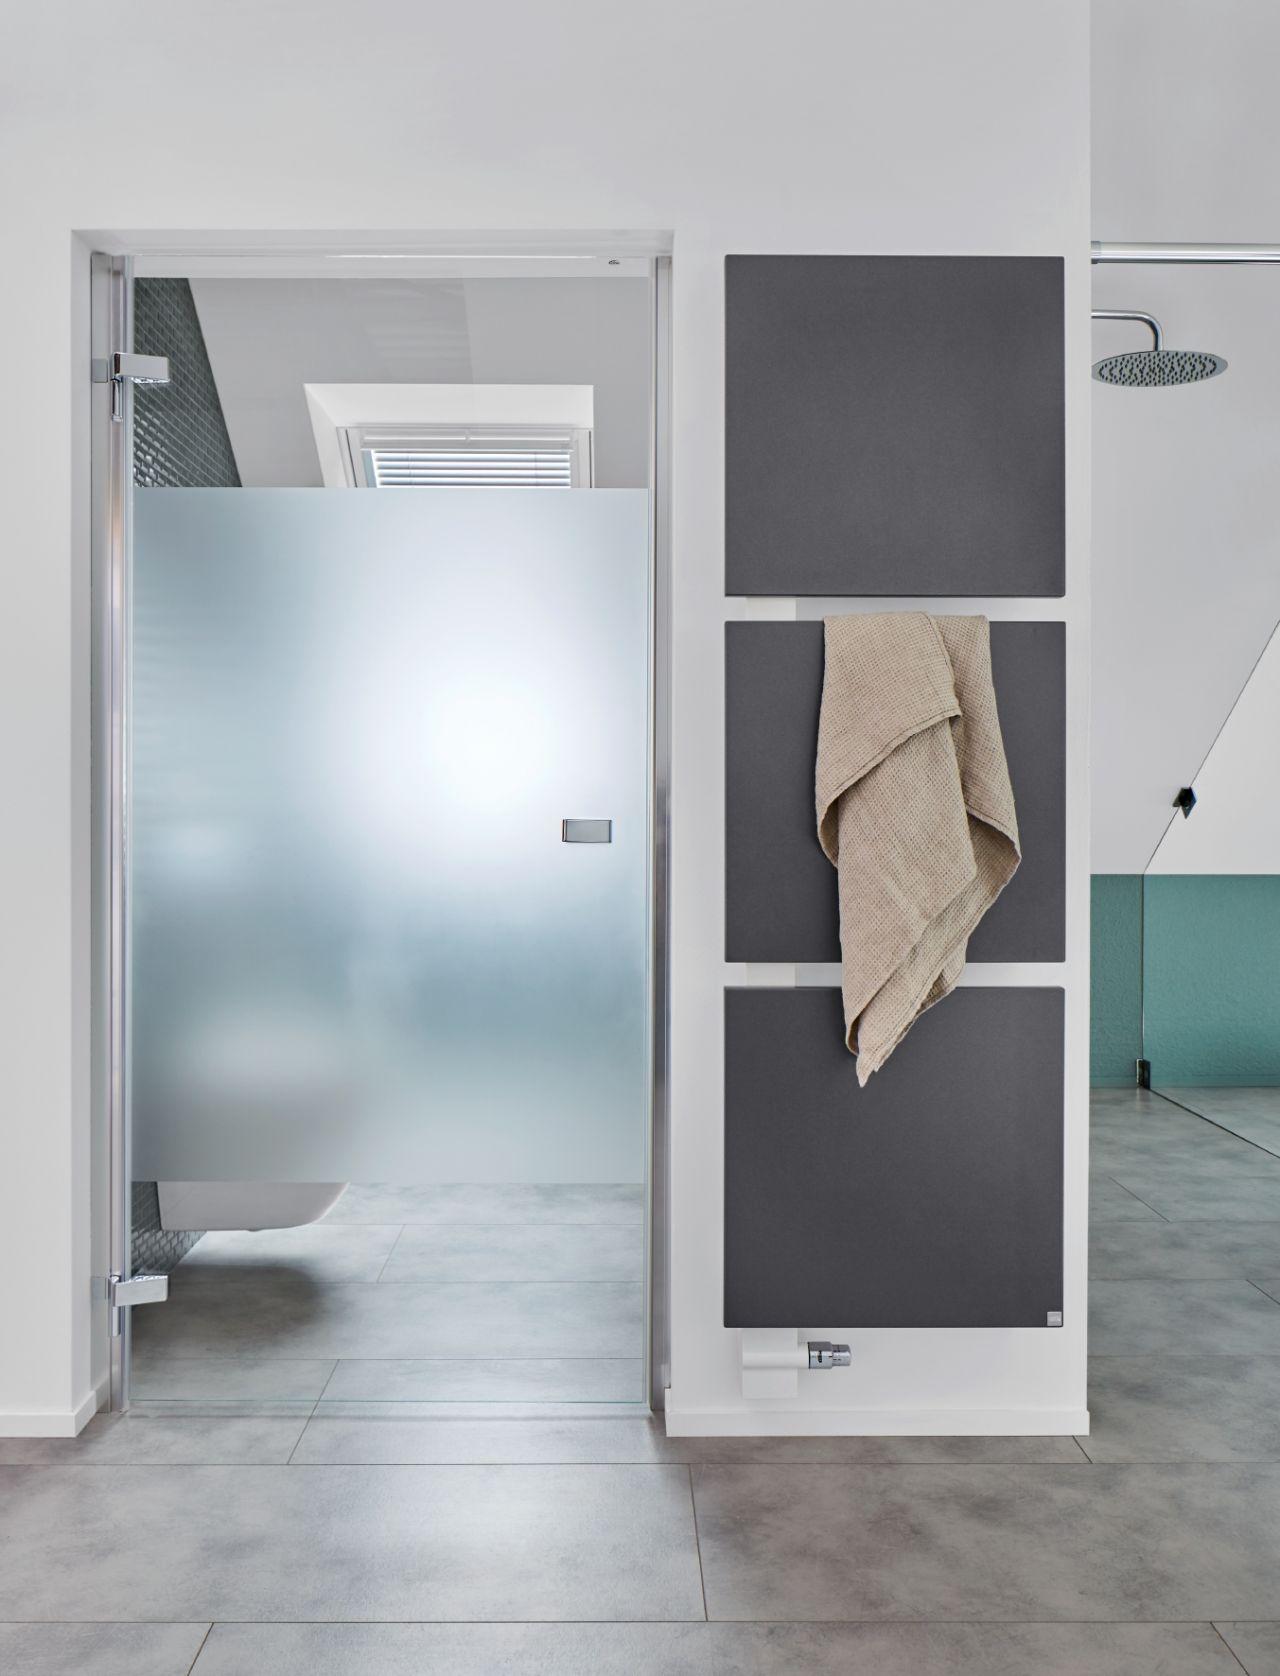 Full Size of Heizkrper Design Funktionalitt Und Sthetik Vereint Bad Heizkörper Für Badezimmer Elektroheizkörper Wohnzimmer Wohnzimmer Kermi Heizkörper